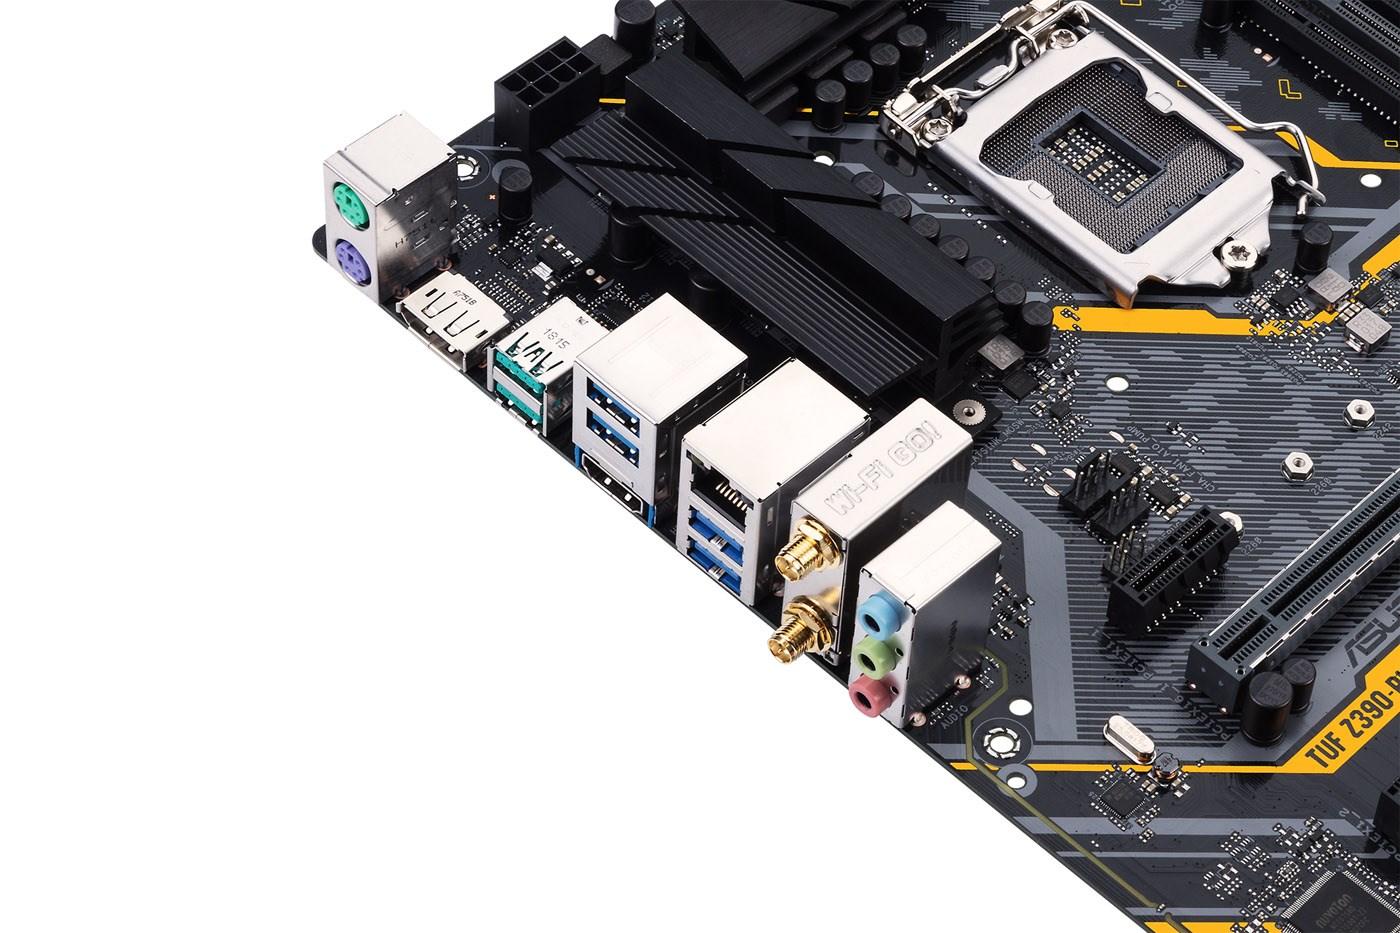 ASUS TUF Z390-PLUS GAMING (WI-FI) ATX Motherboard for Intel LGA1151